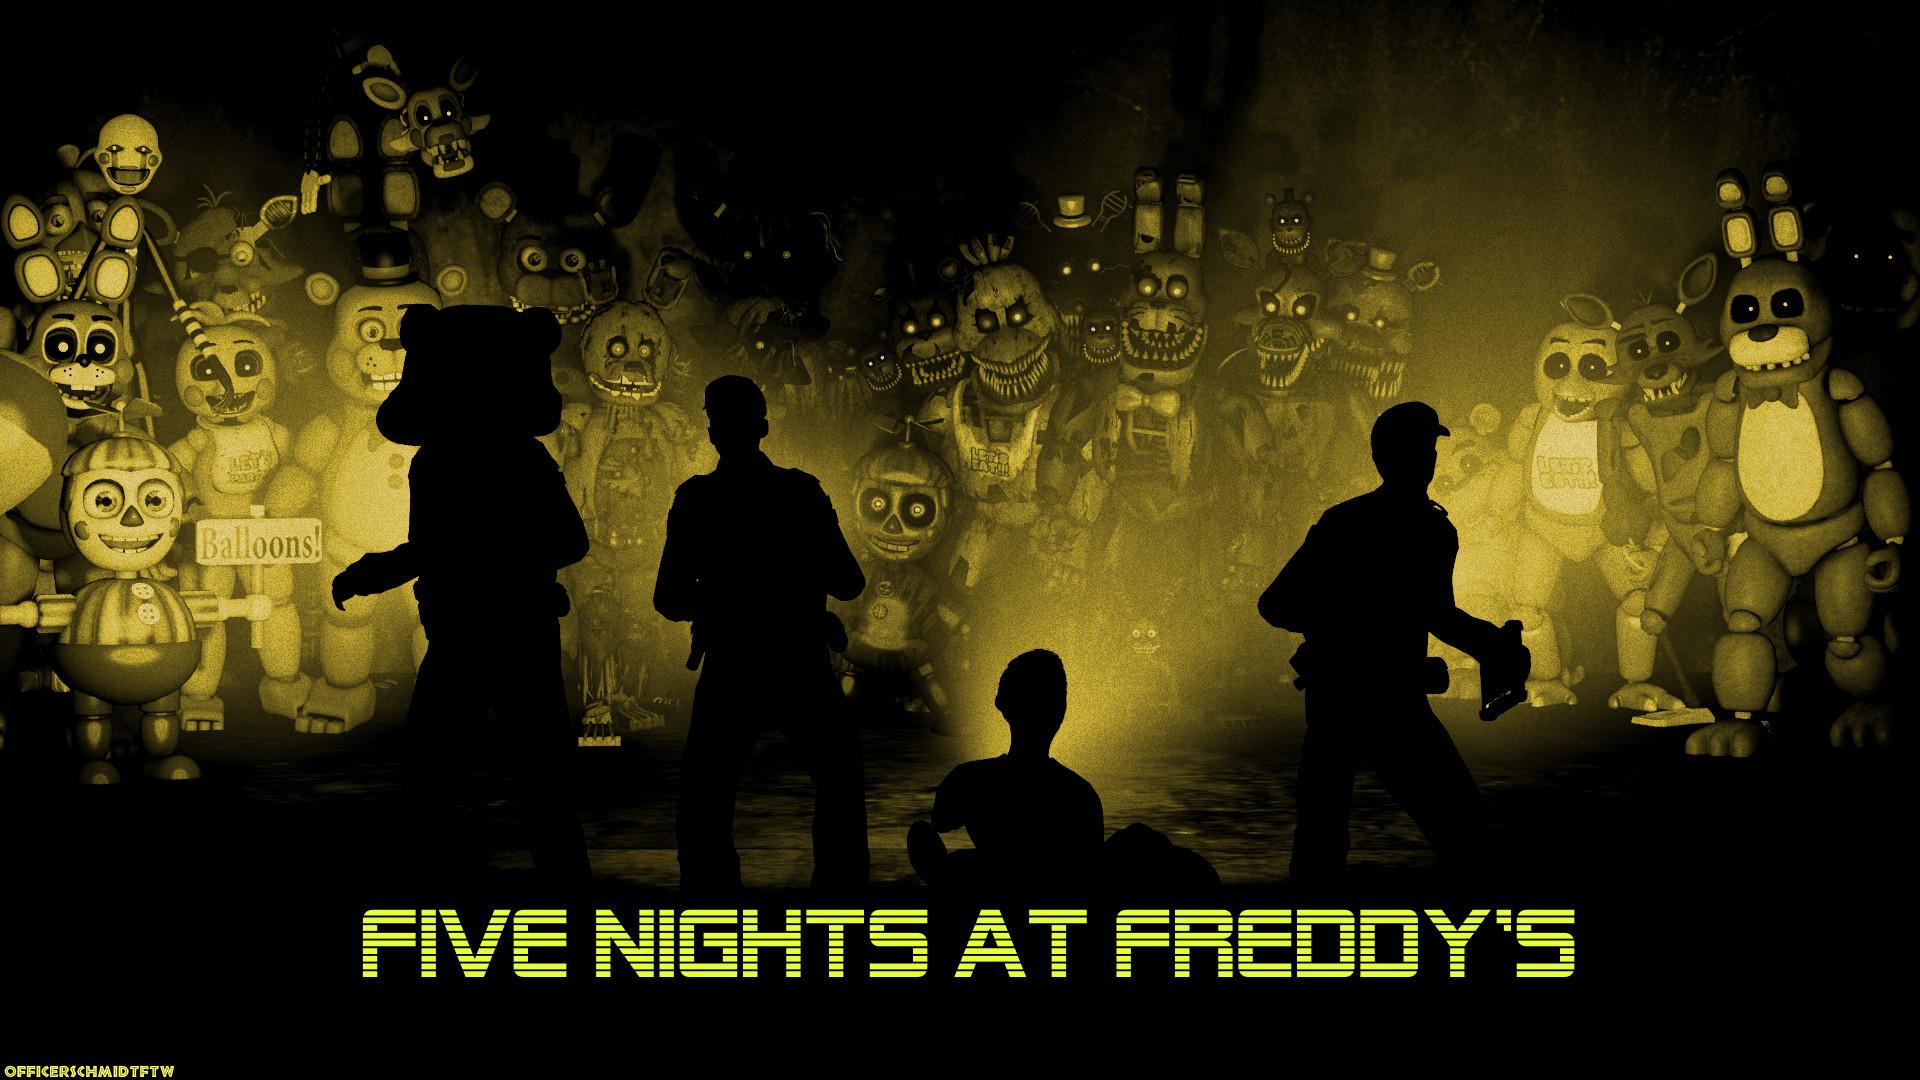 … OfficerSchmidtFTW Five Nights at Freddy's (SFM) by OfficerSchmidtFTW